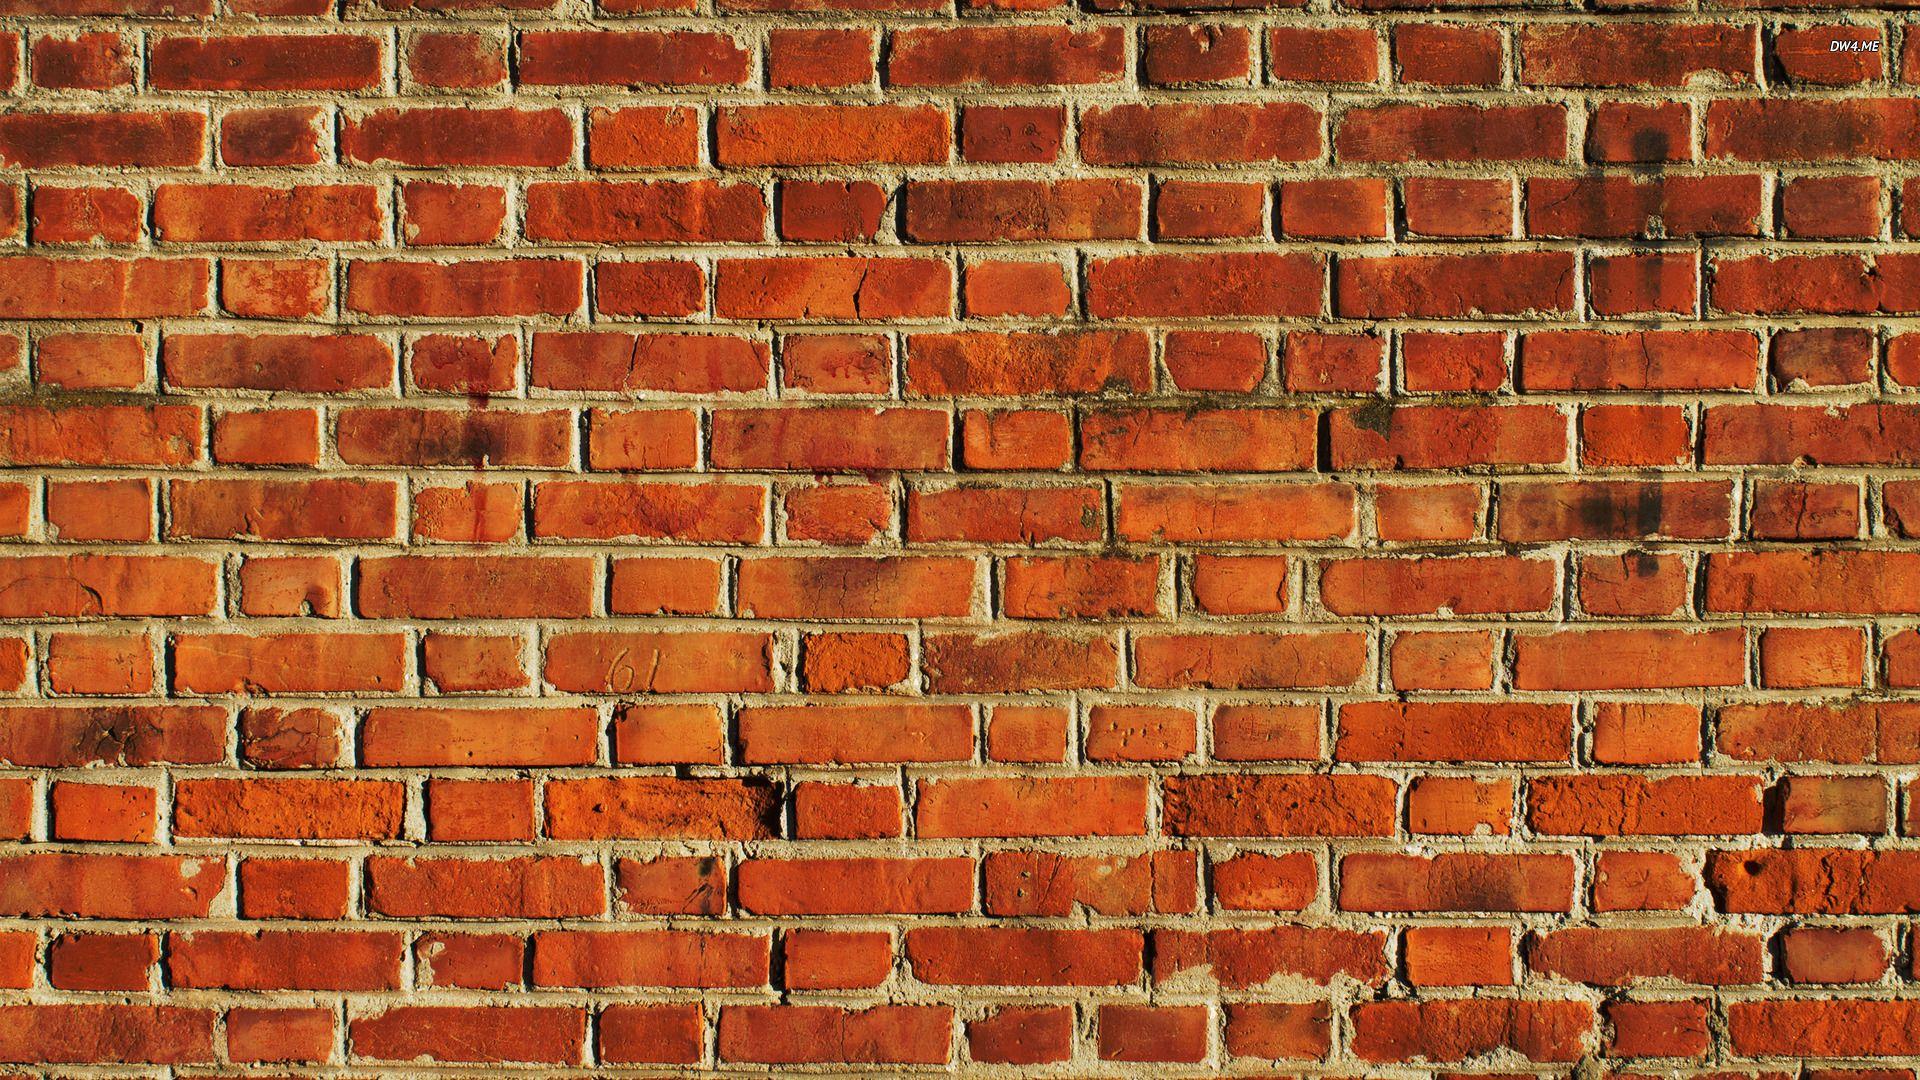 Brick Wallpaper Wallaadoo Com Papel De Parede Tijolo Muro De Tijolos Fundo De Parede De Tijolo